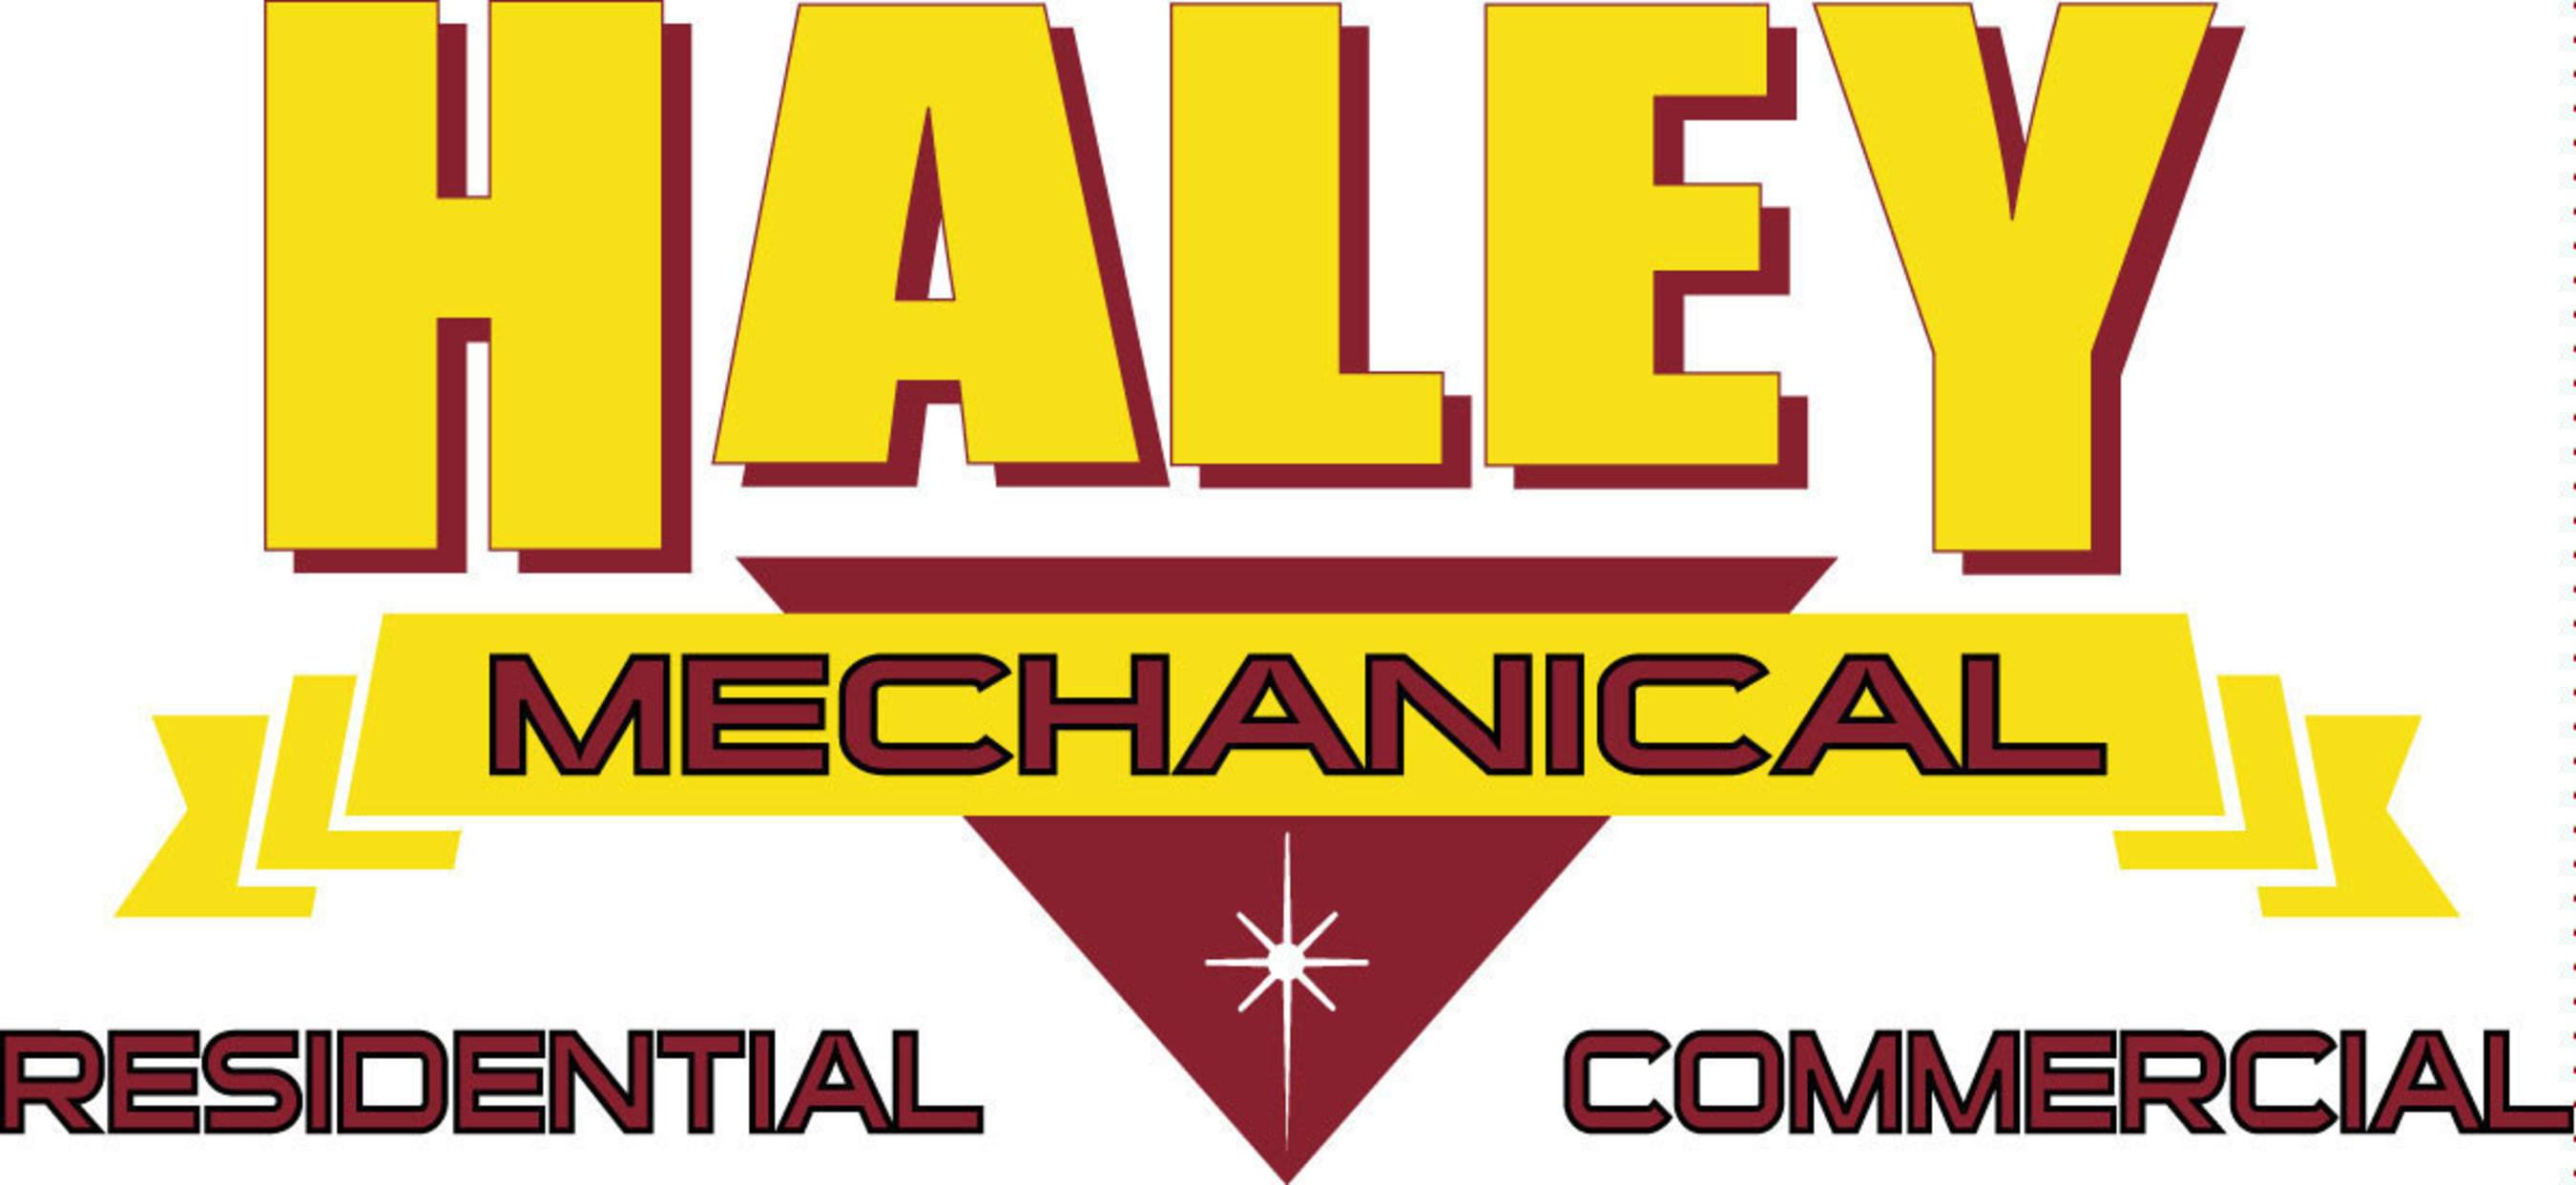 Haley Mechanical, Ann Arbor, Michigan HVAC Contractor Earns Esteemed Super Service Award from